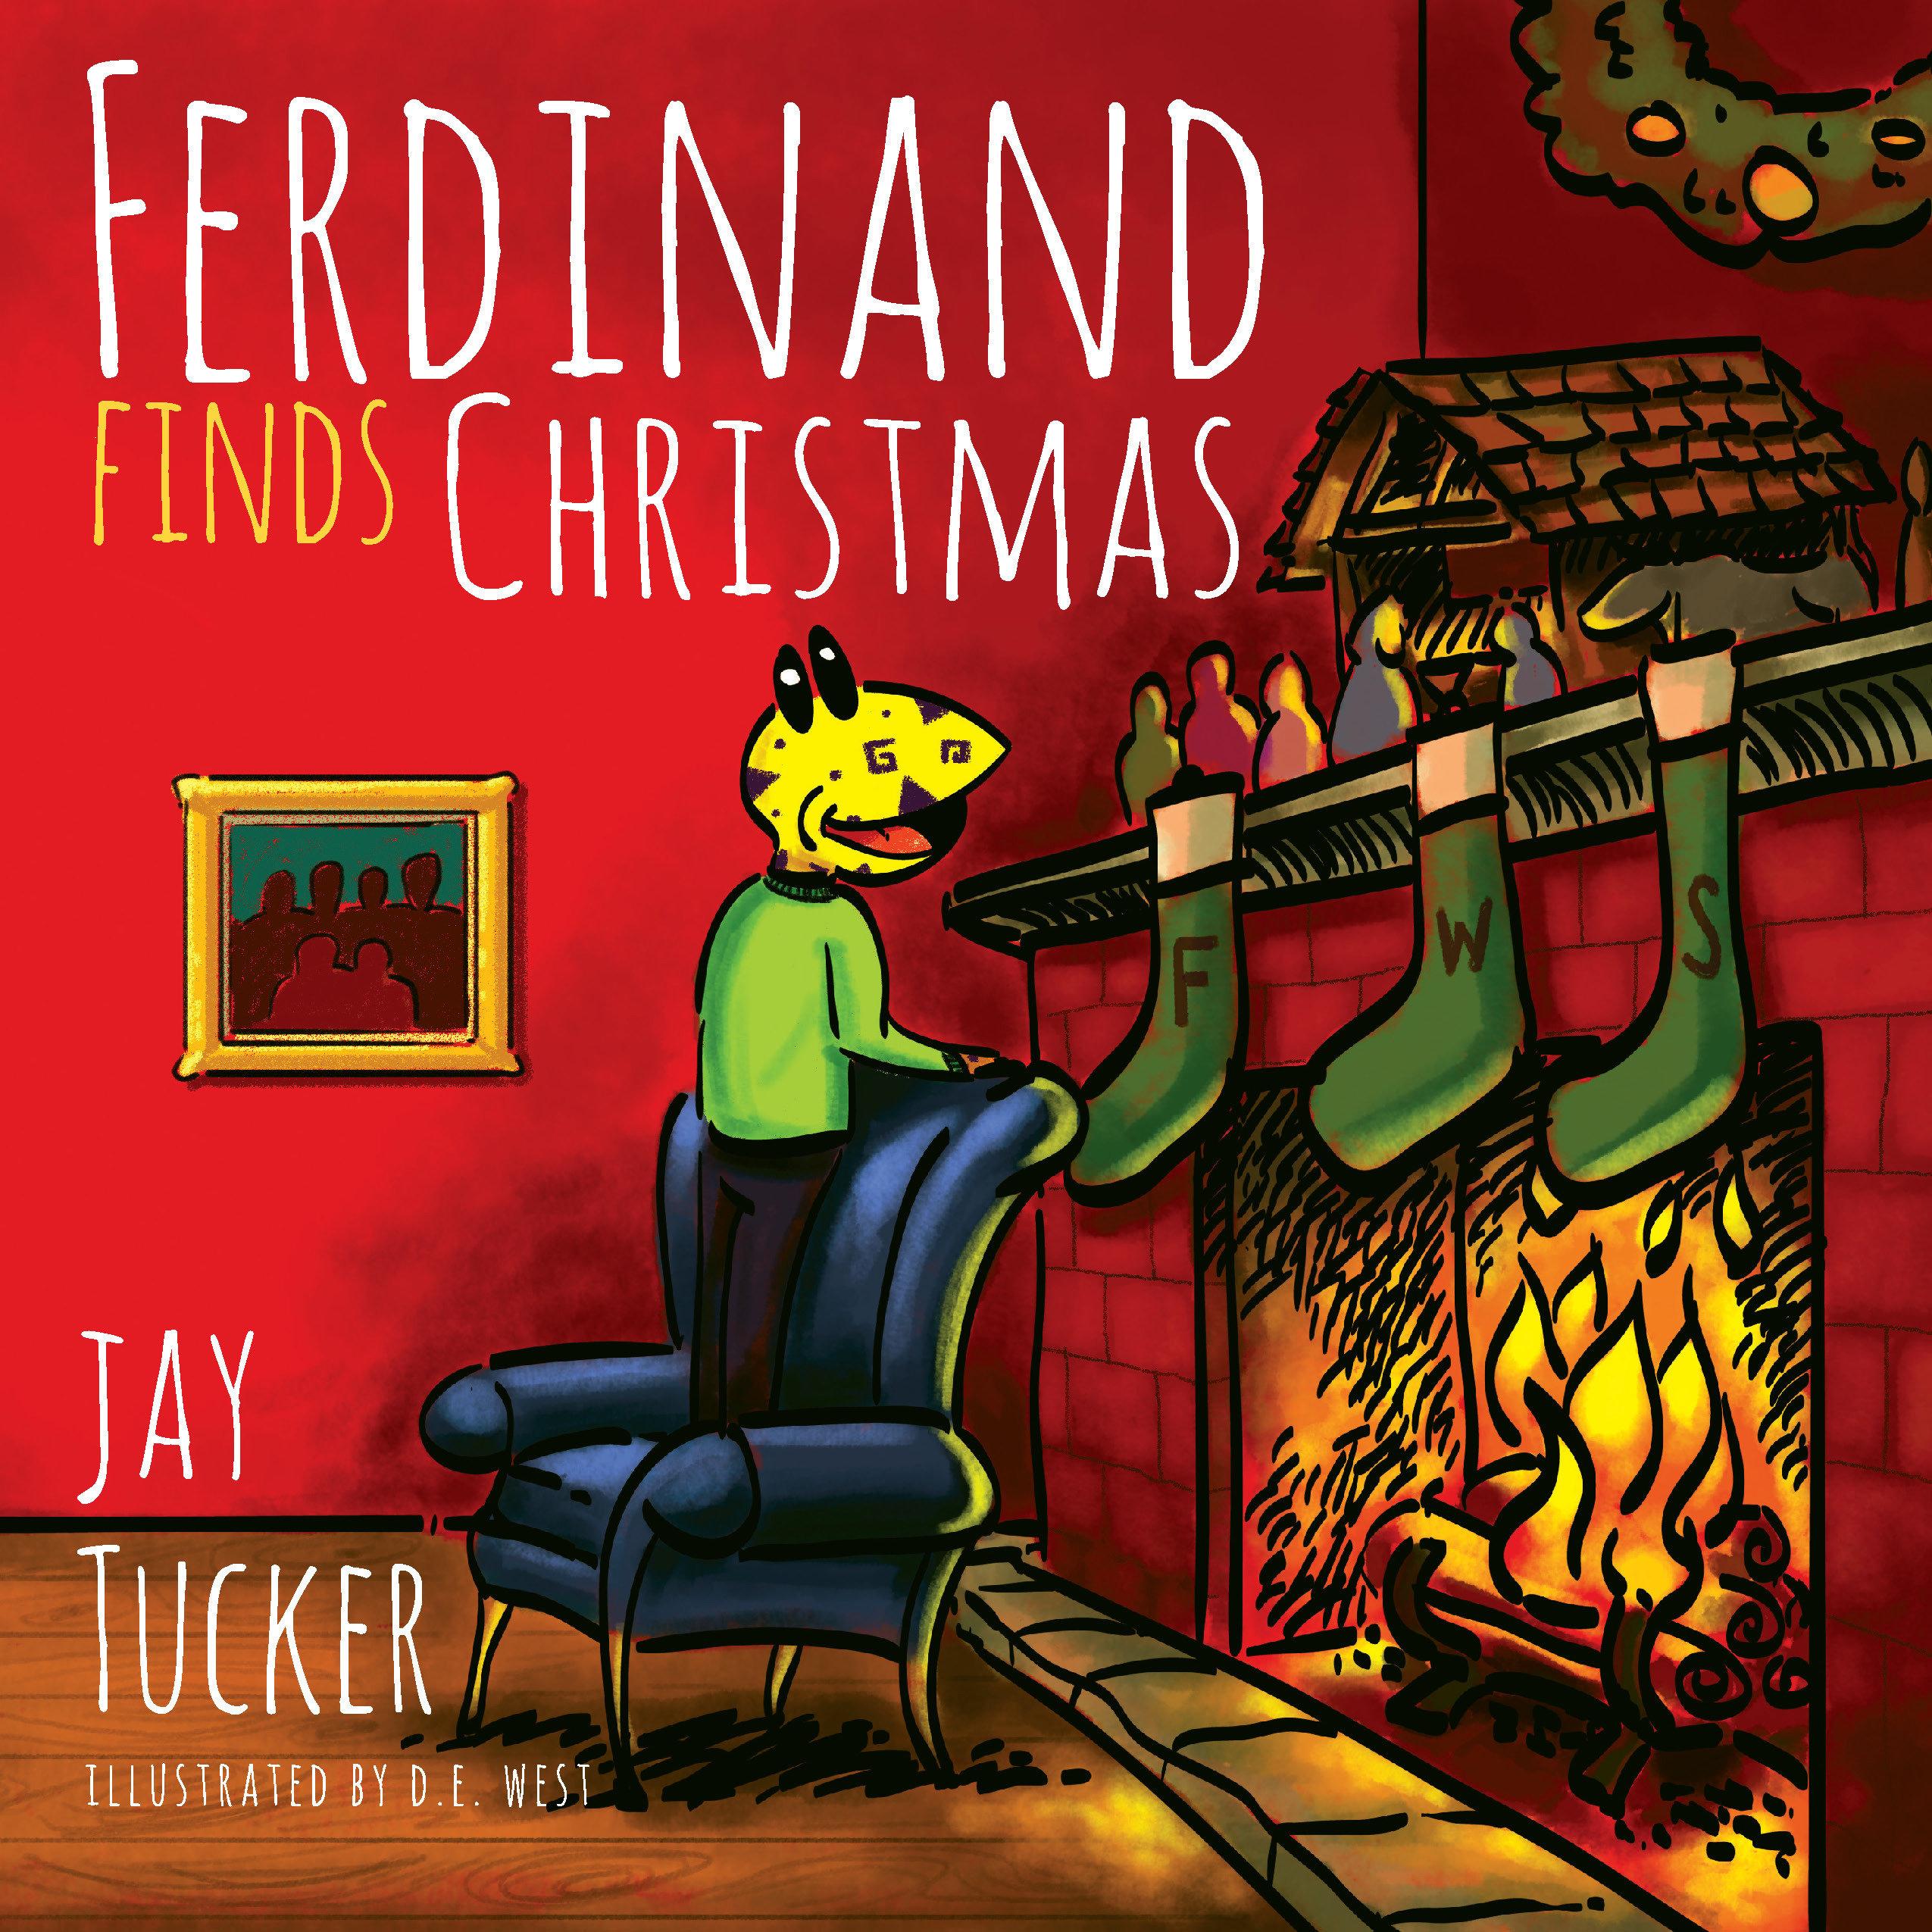 Ferdinand Finds Christmas 978-1-61599-253-9